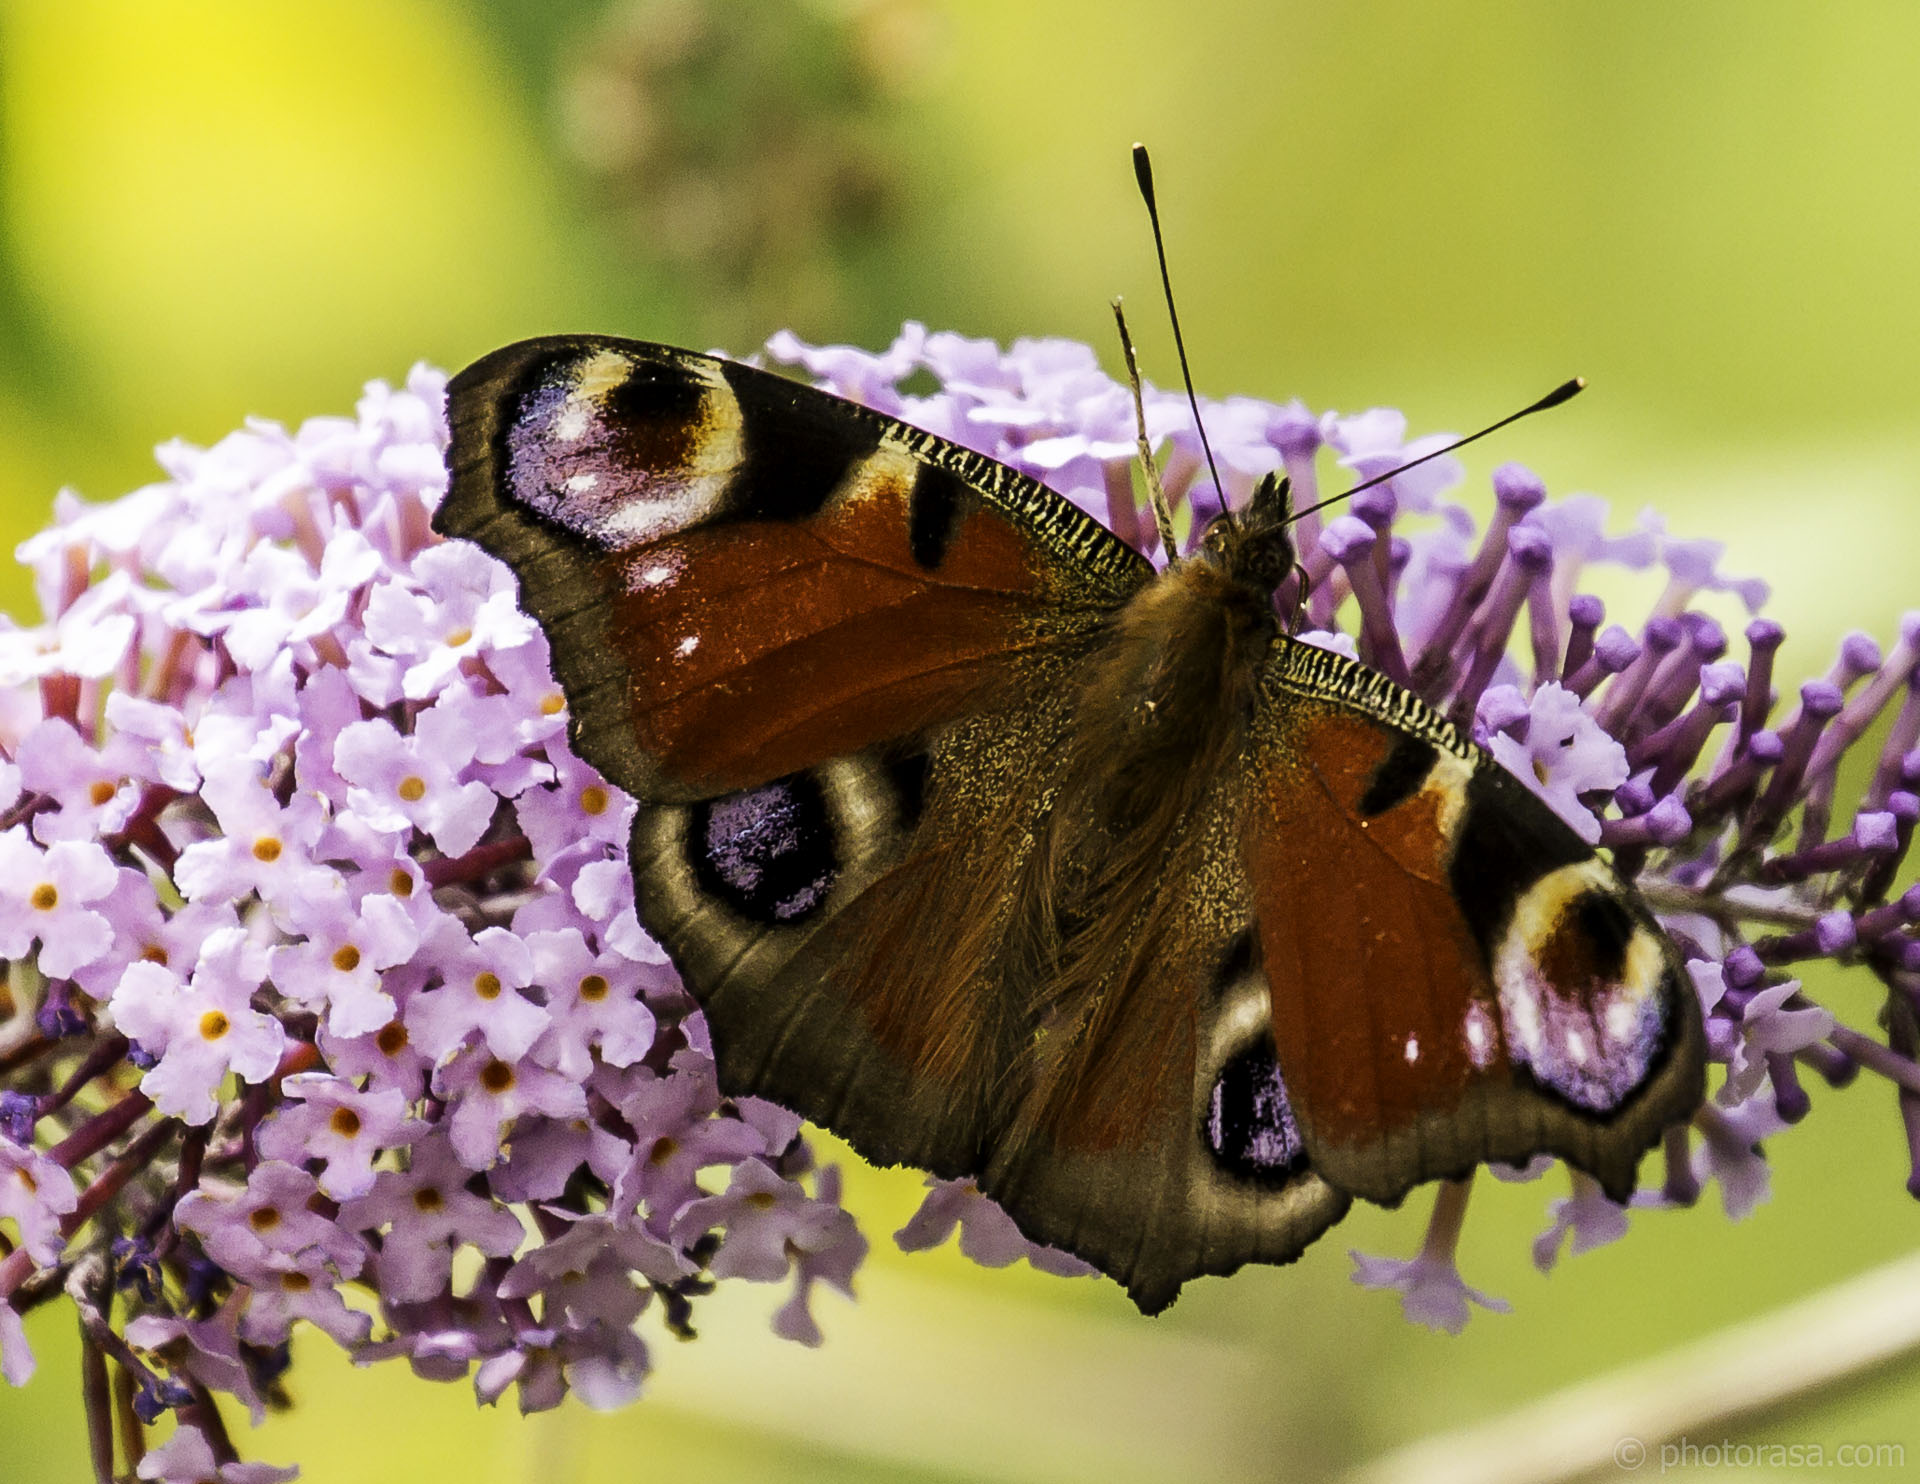 https://photorasa.com/peacock-butterfly/female-peacock-butterfly-2/